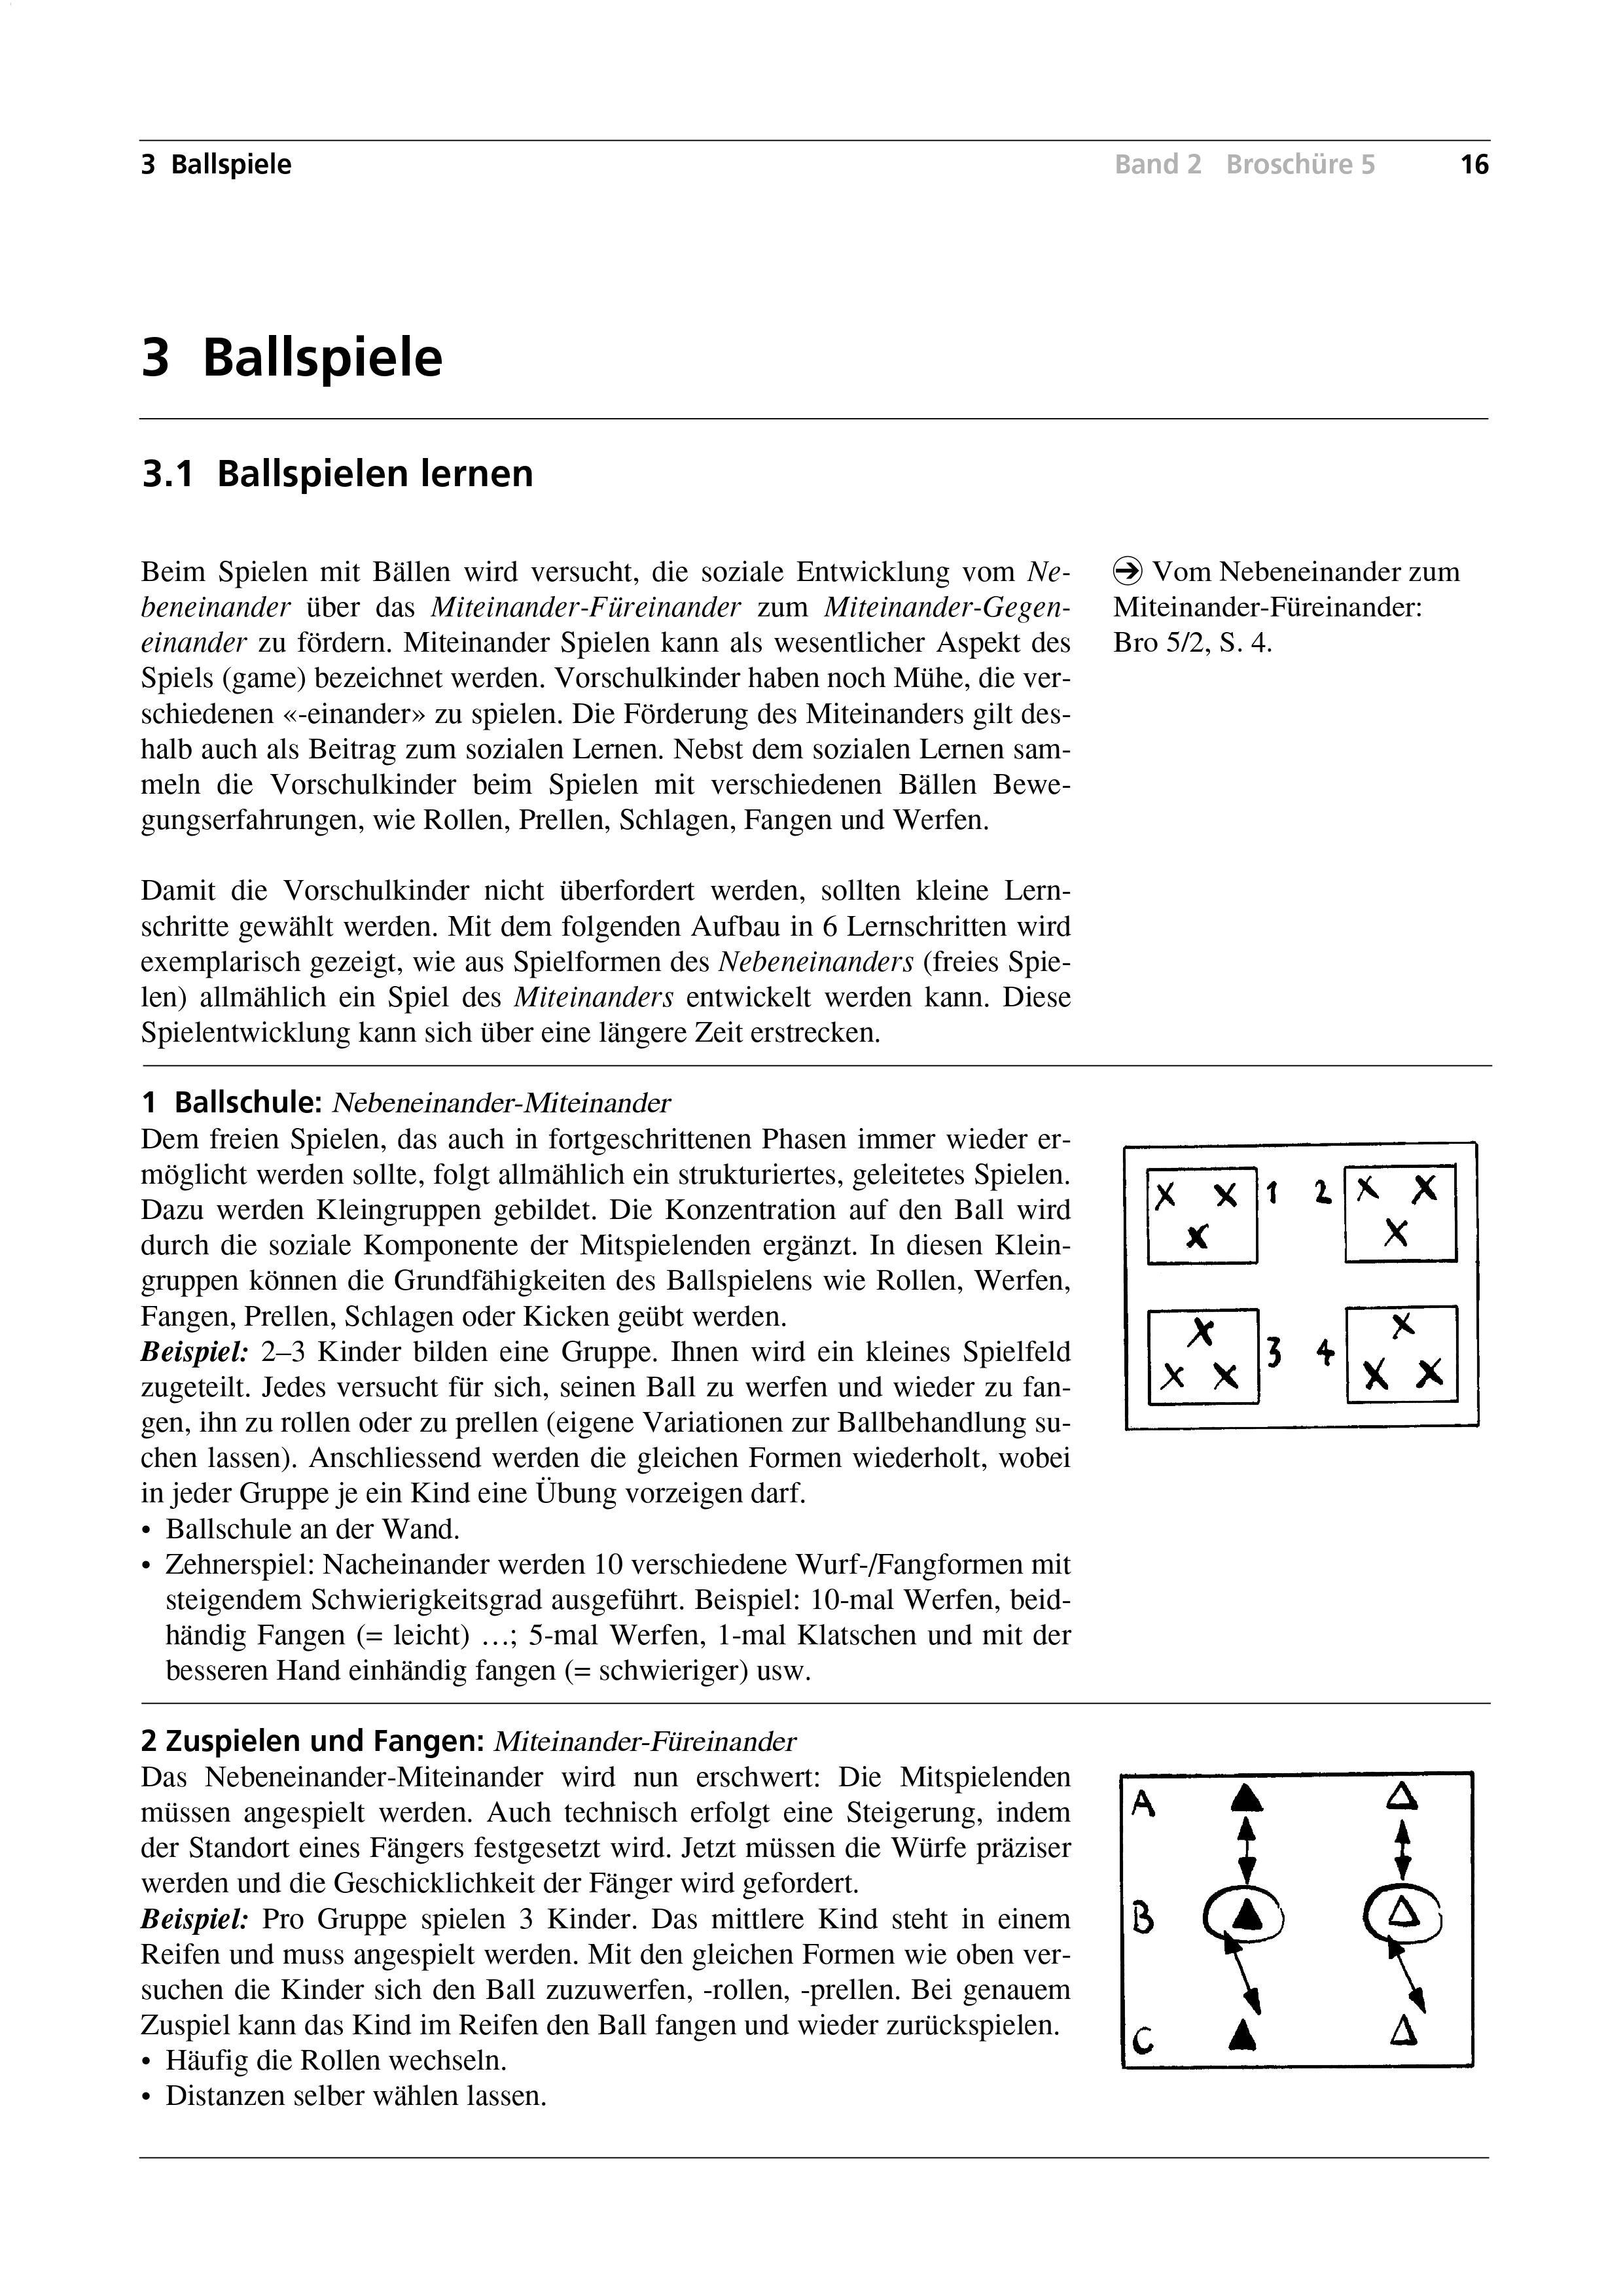 Preview image for LOM object Ballspielen lernen